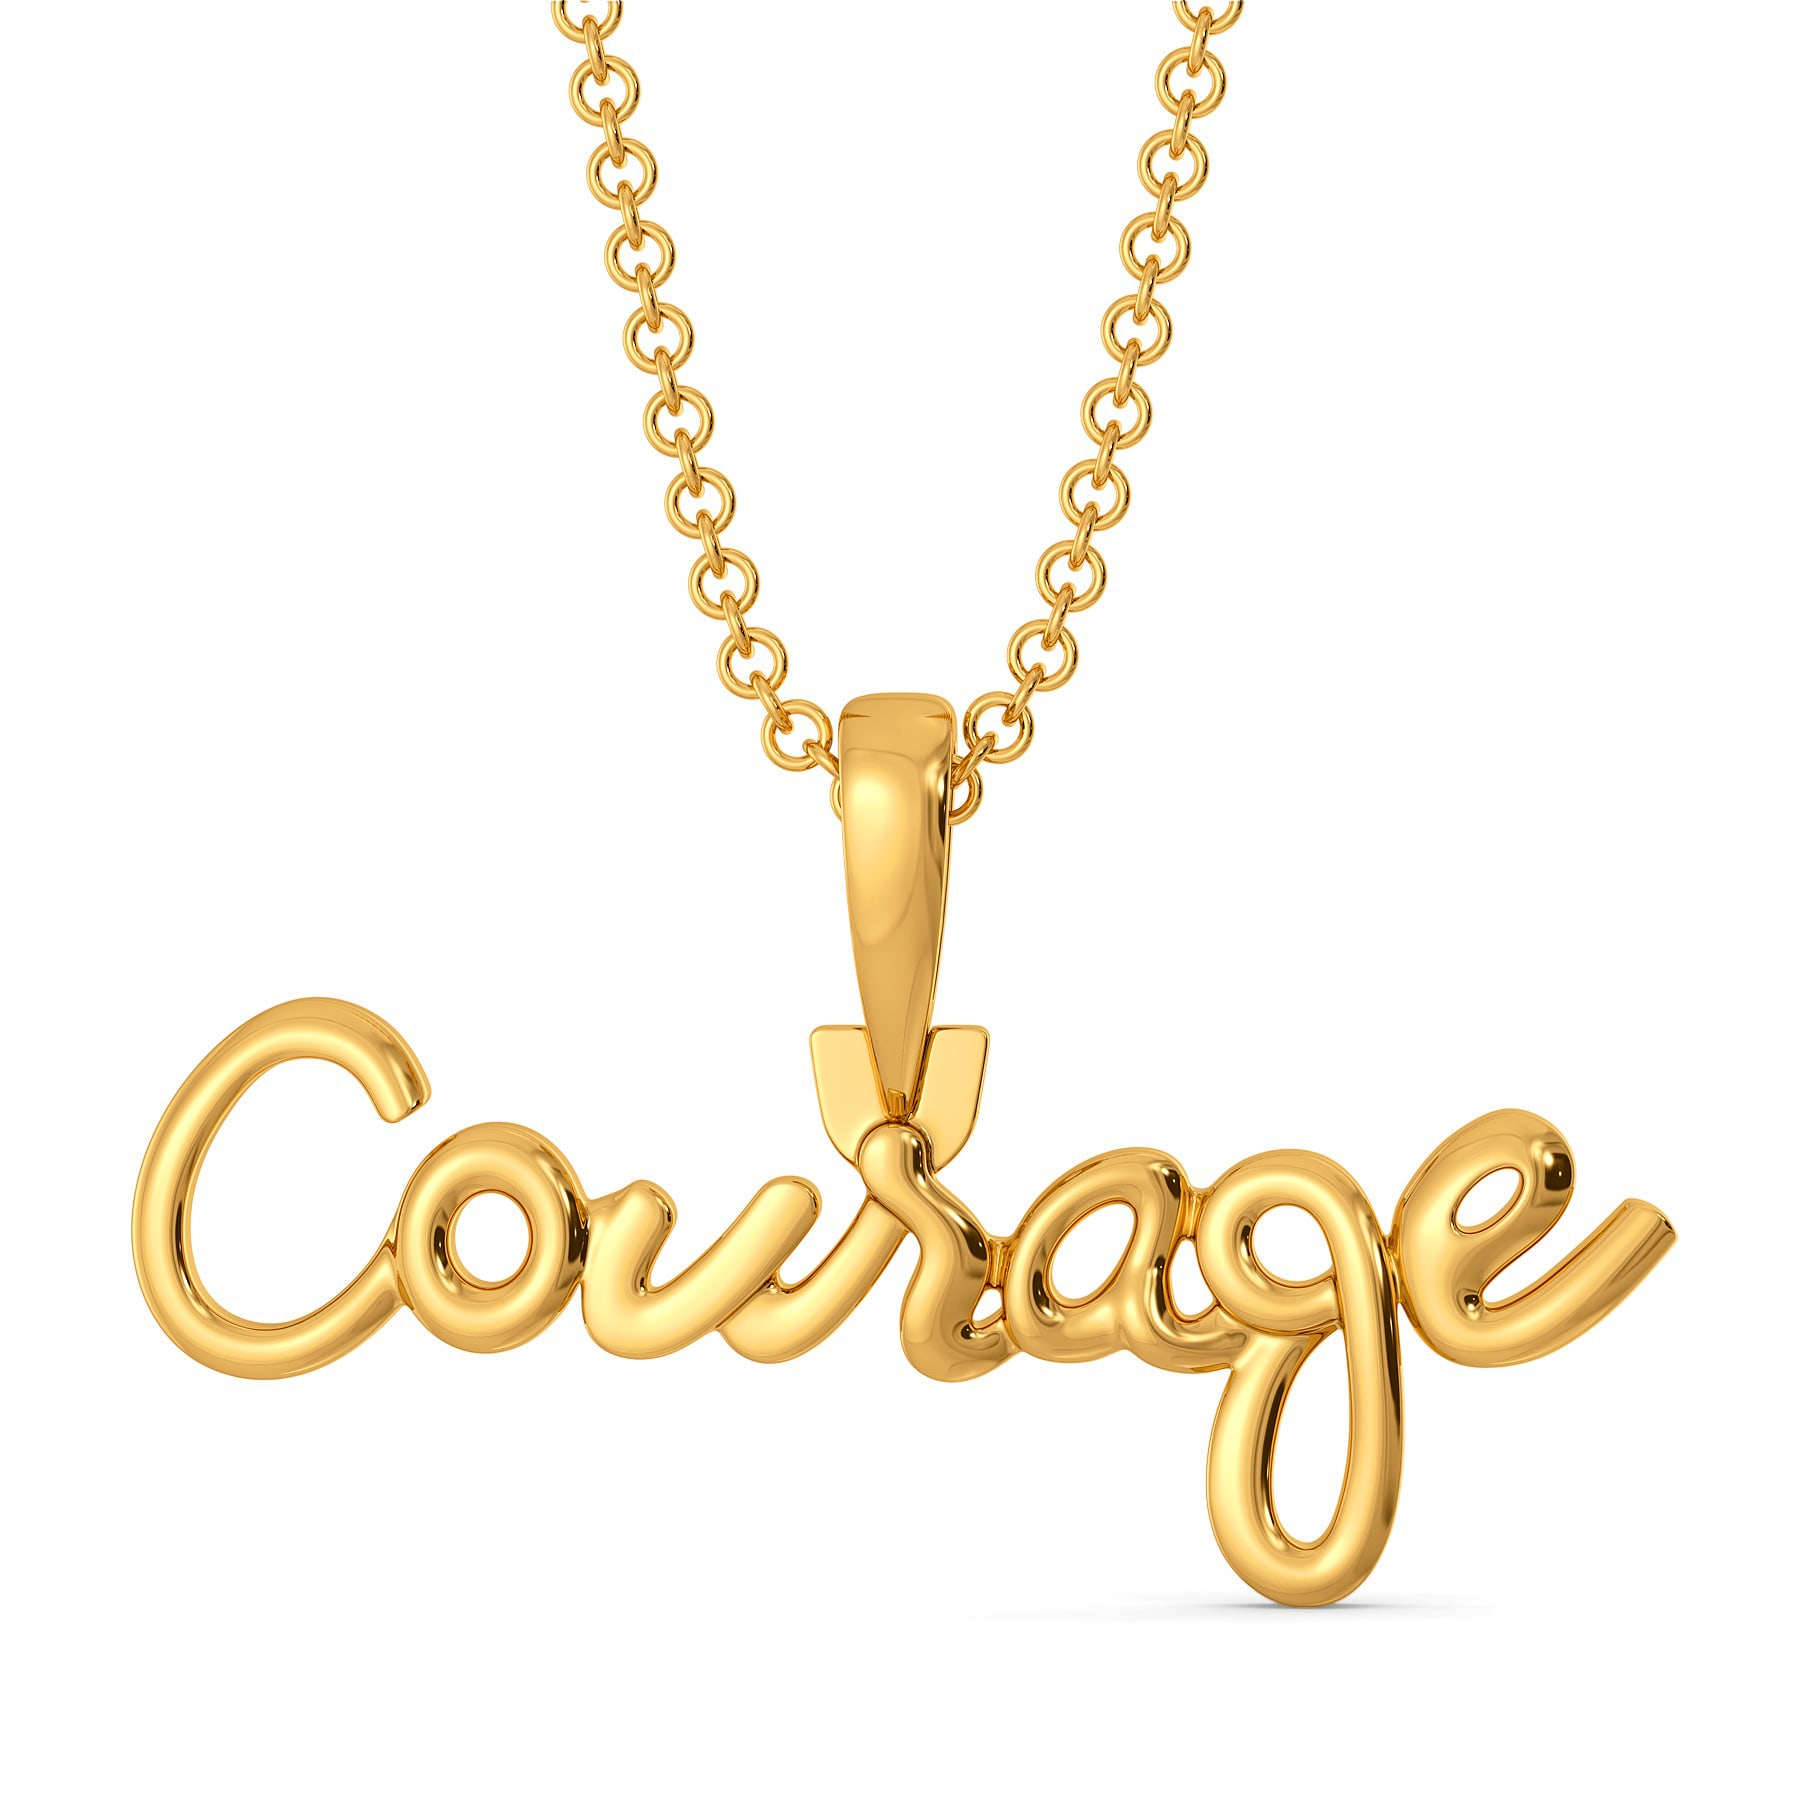 Courage, Dear Heart Gold Pendants